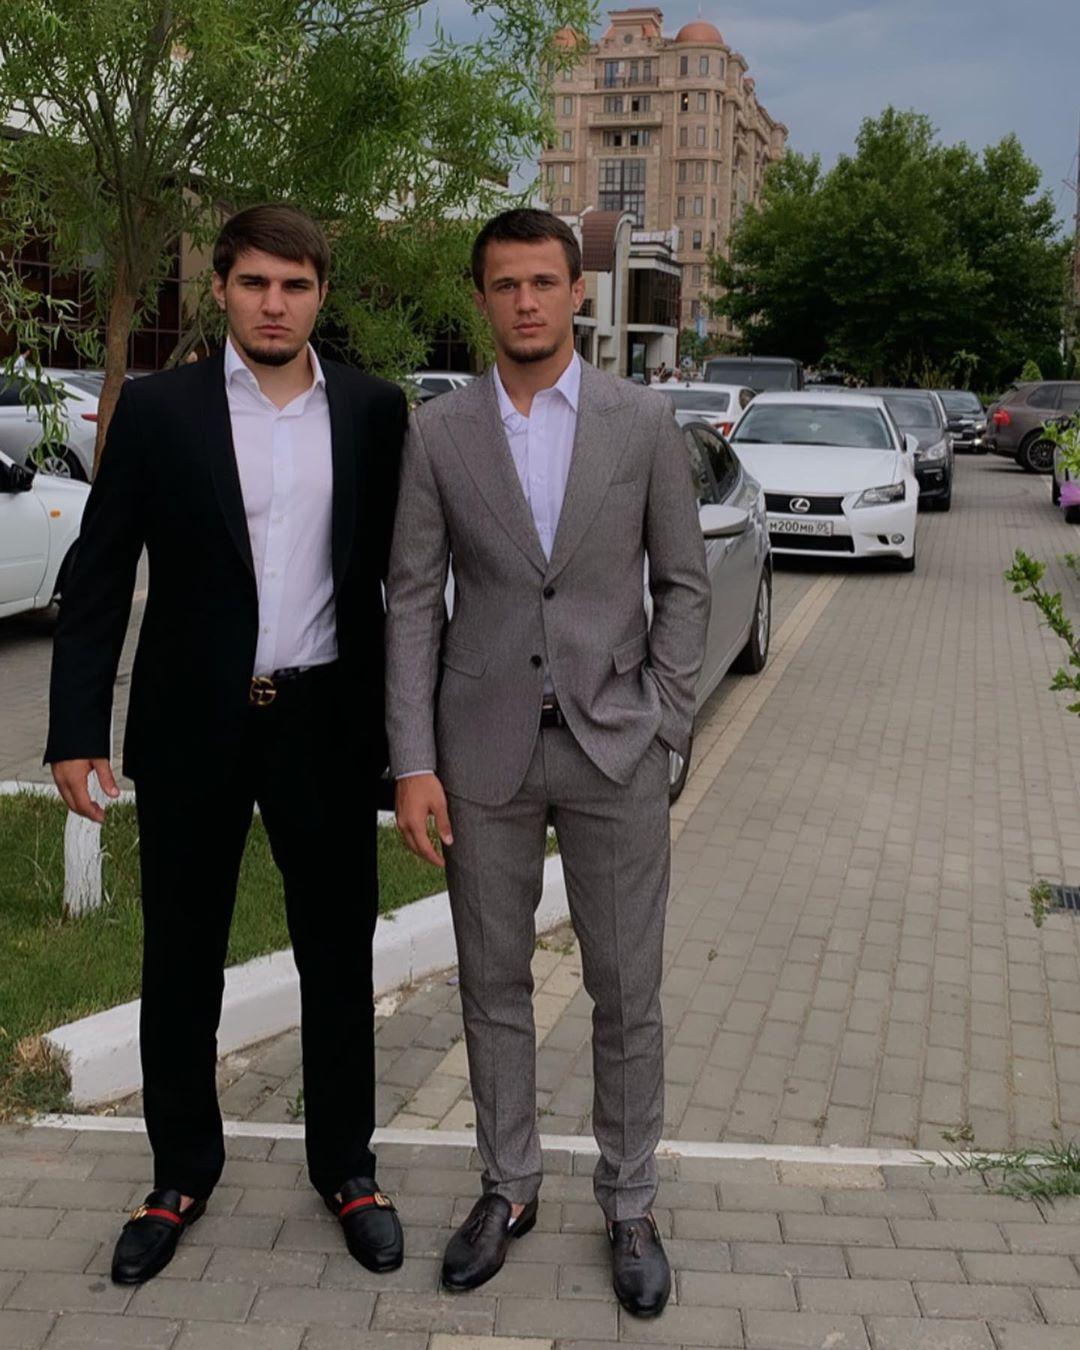 Усман и Умар Нурмагомедовы